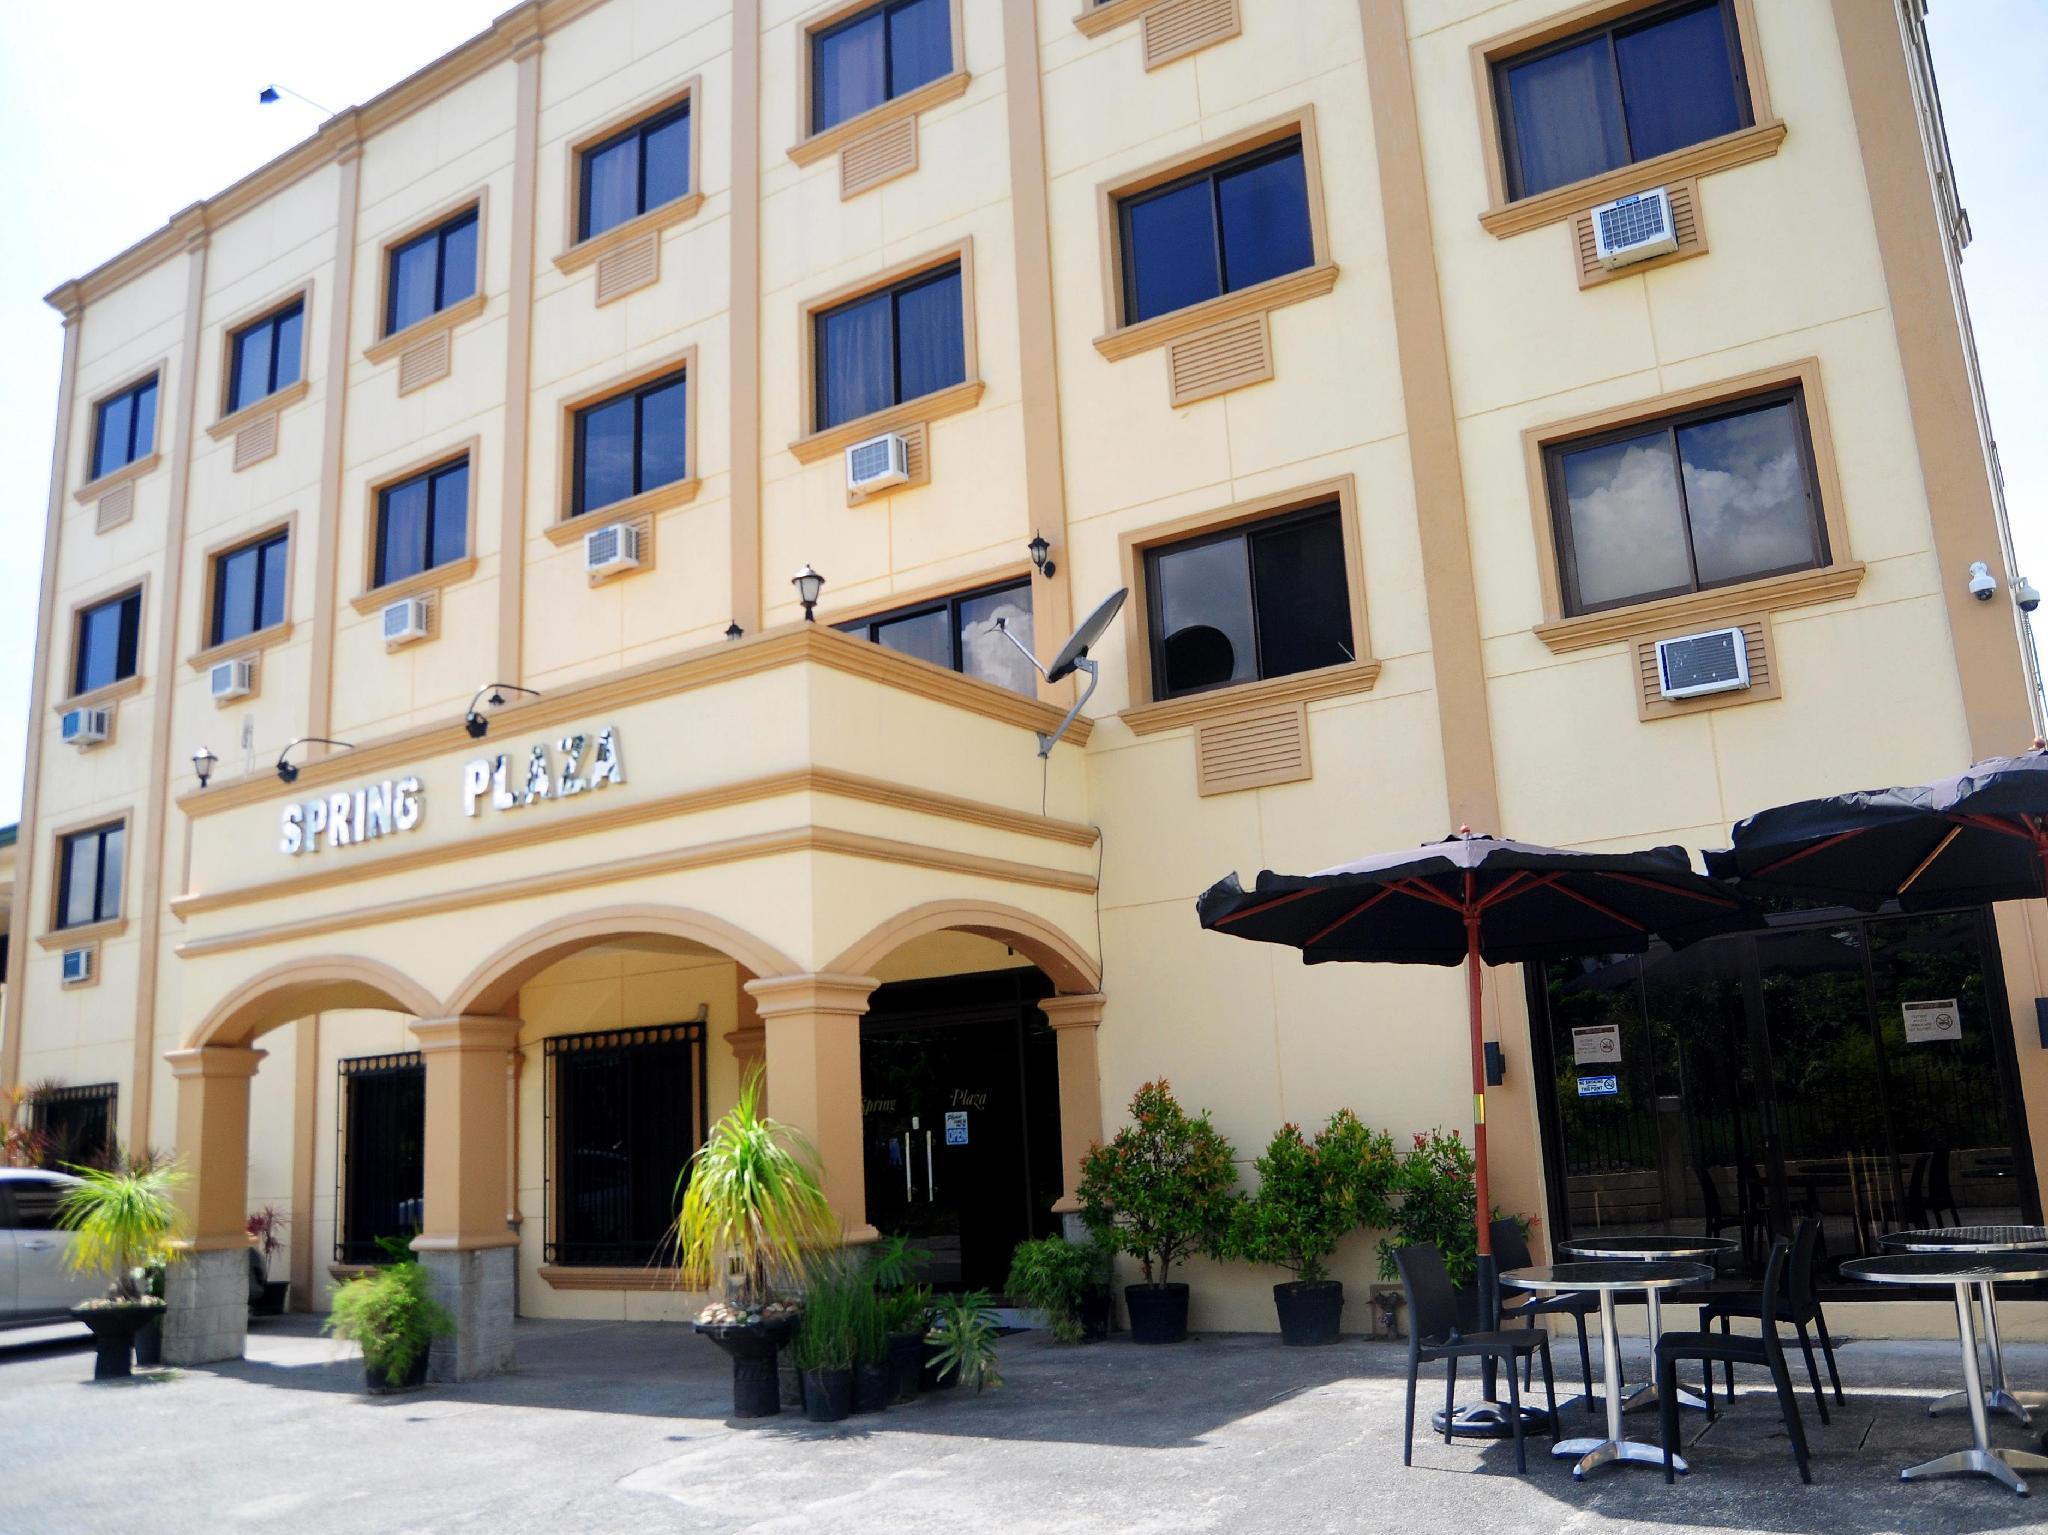 Spring plaza hotel dasmarinas cavite philippines for Plaza hotel